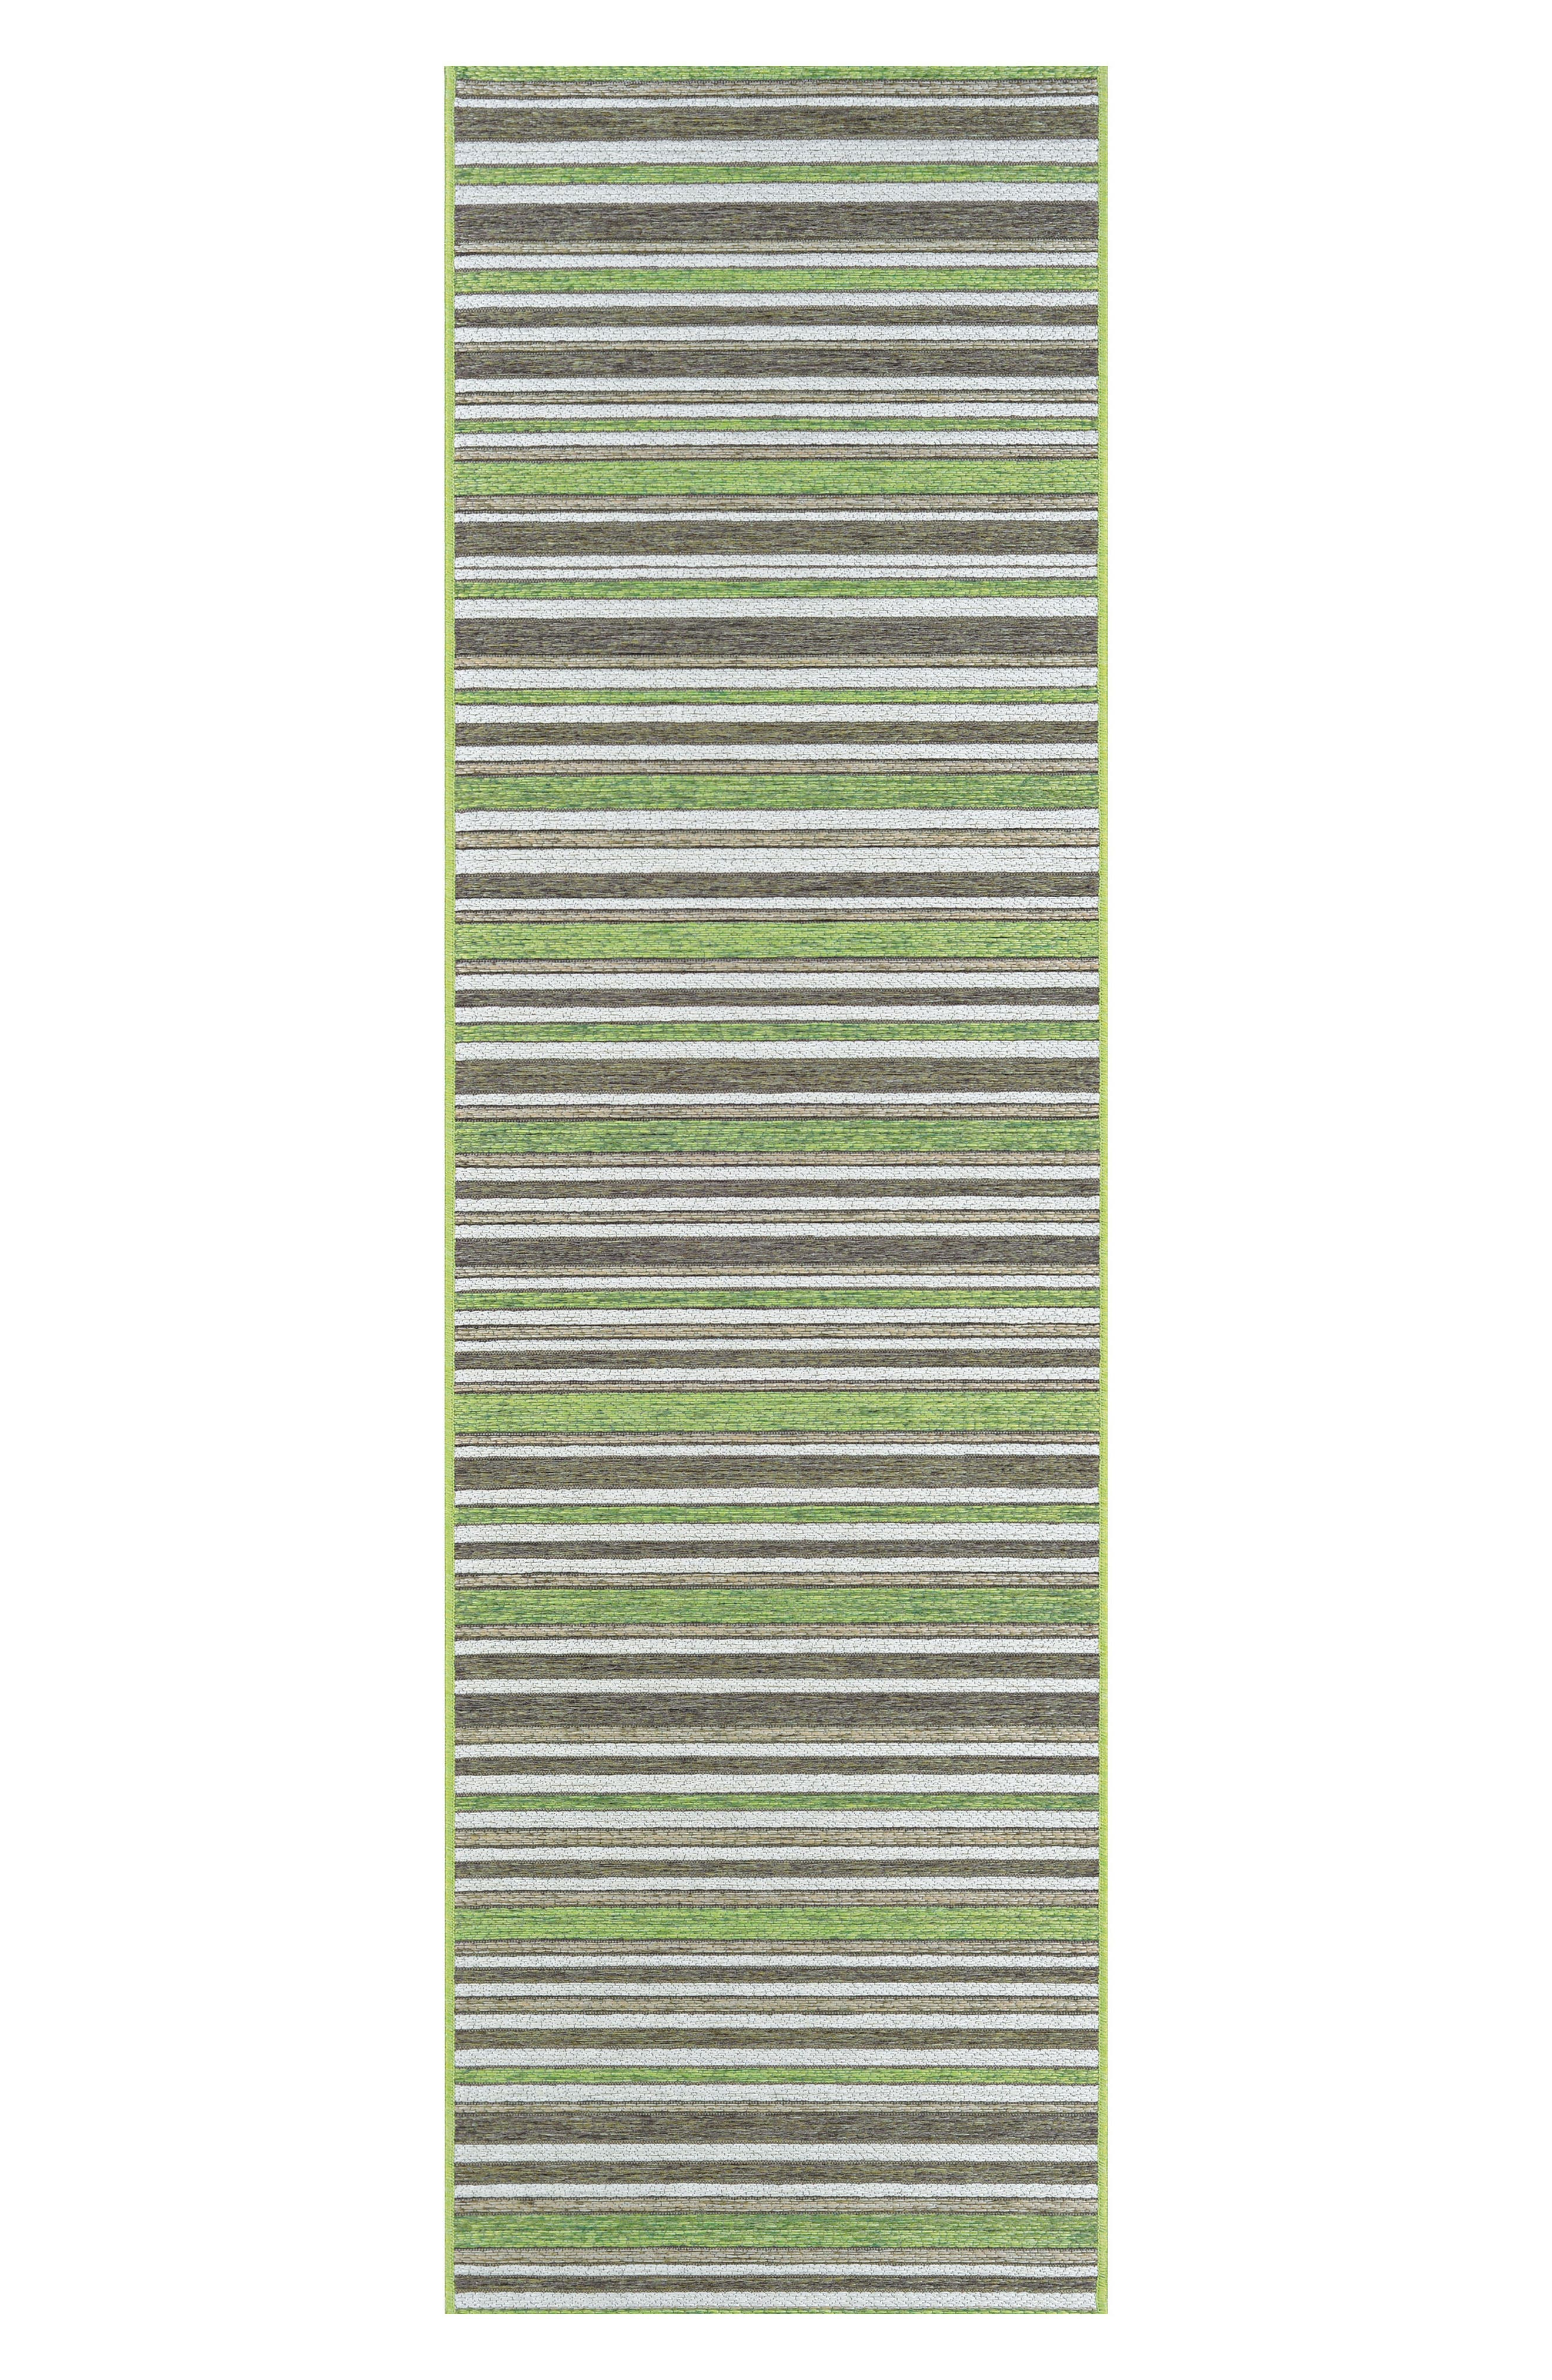 Brockton Indoor/Outdoor Rug,                             Alternate thumbnail 2, color,                             Hunter Green/ Brown